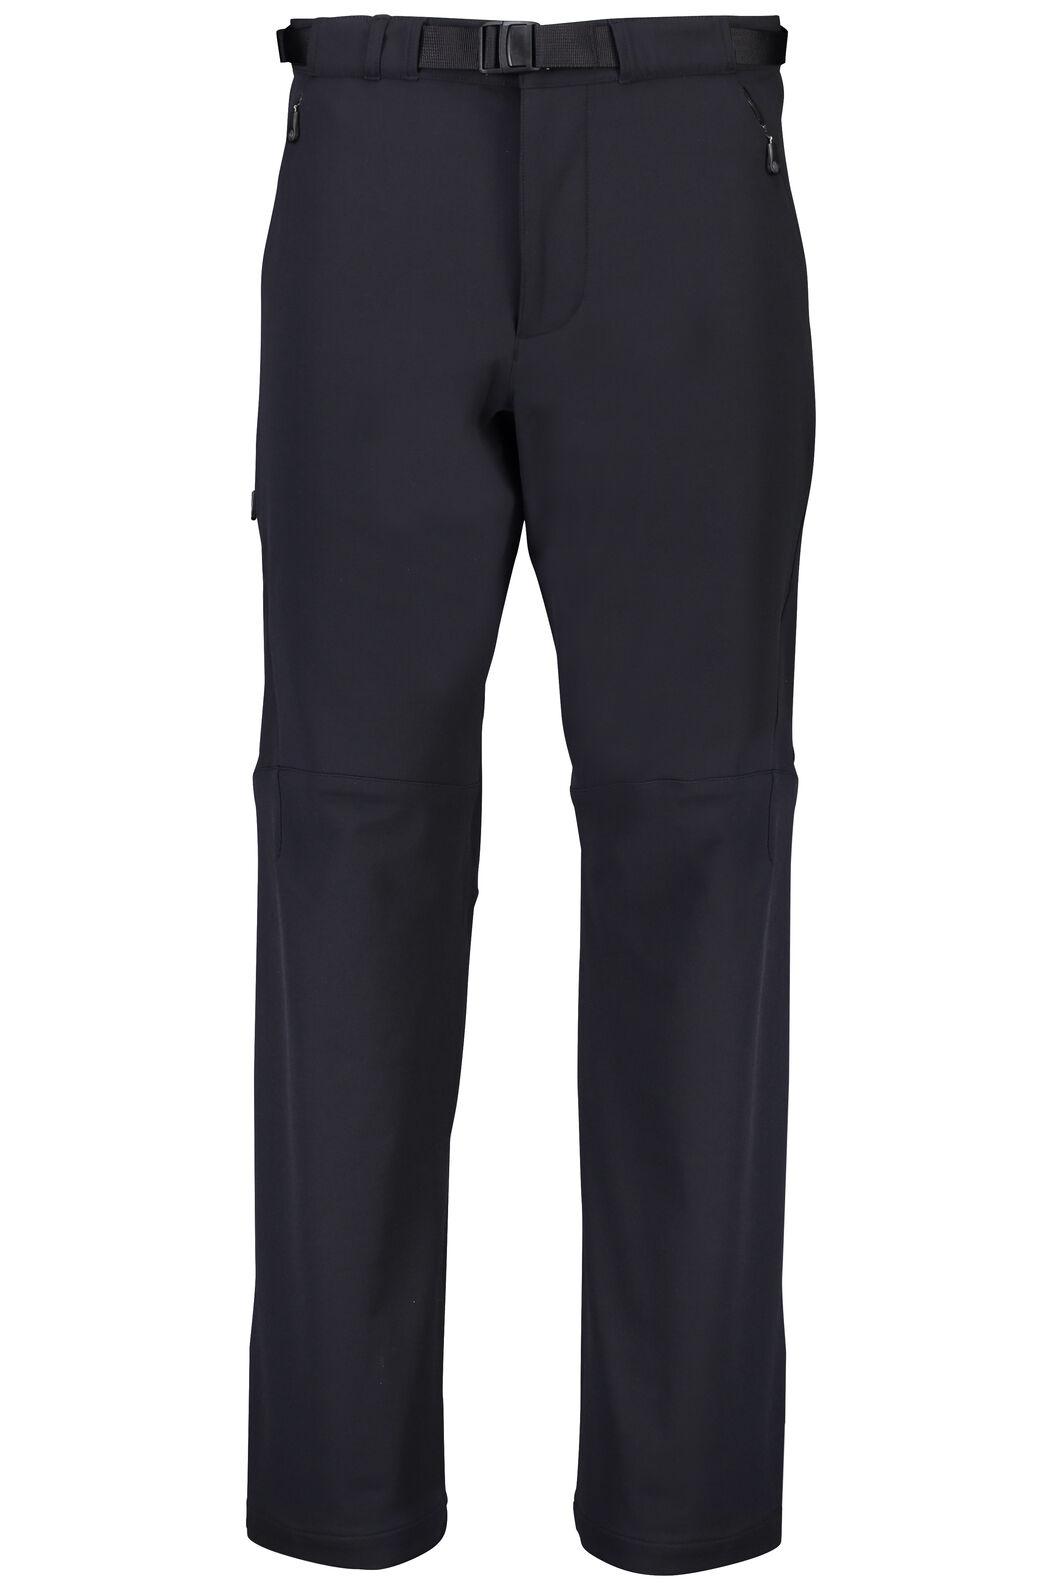 Nemesis Softshell Pants - Men's, Black, hi-res